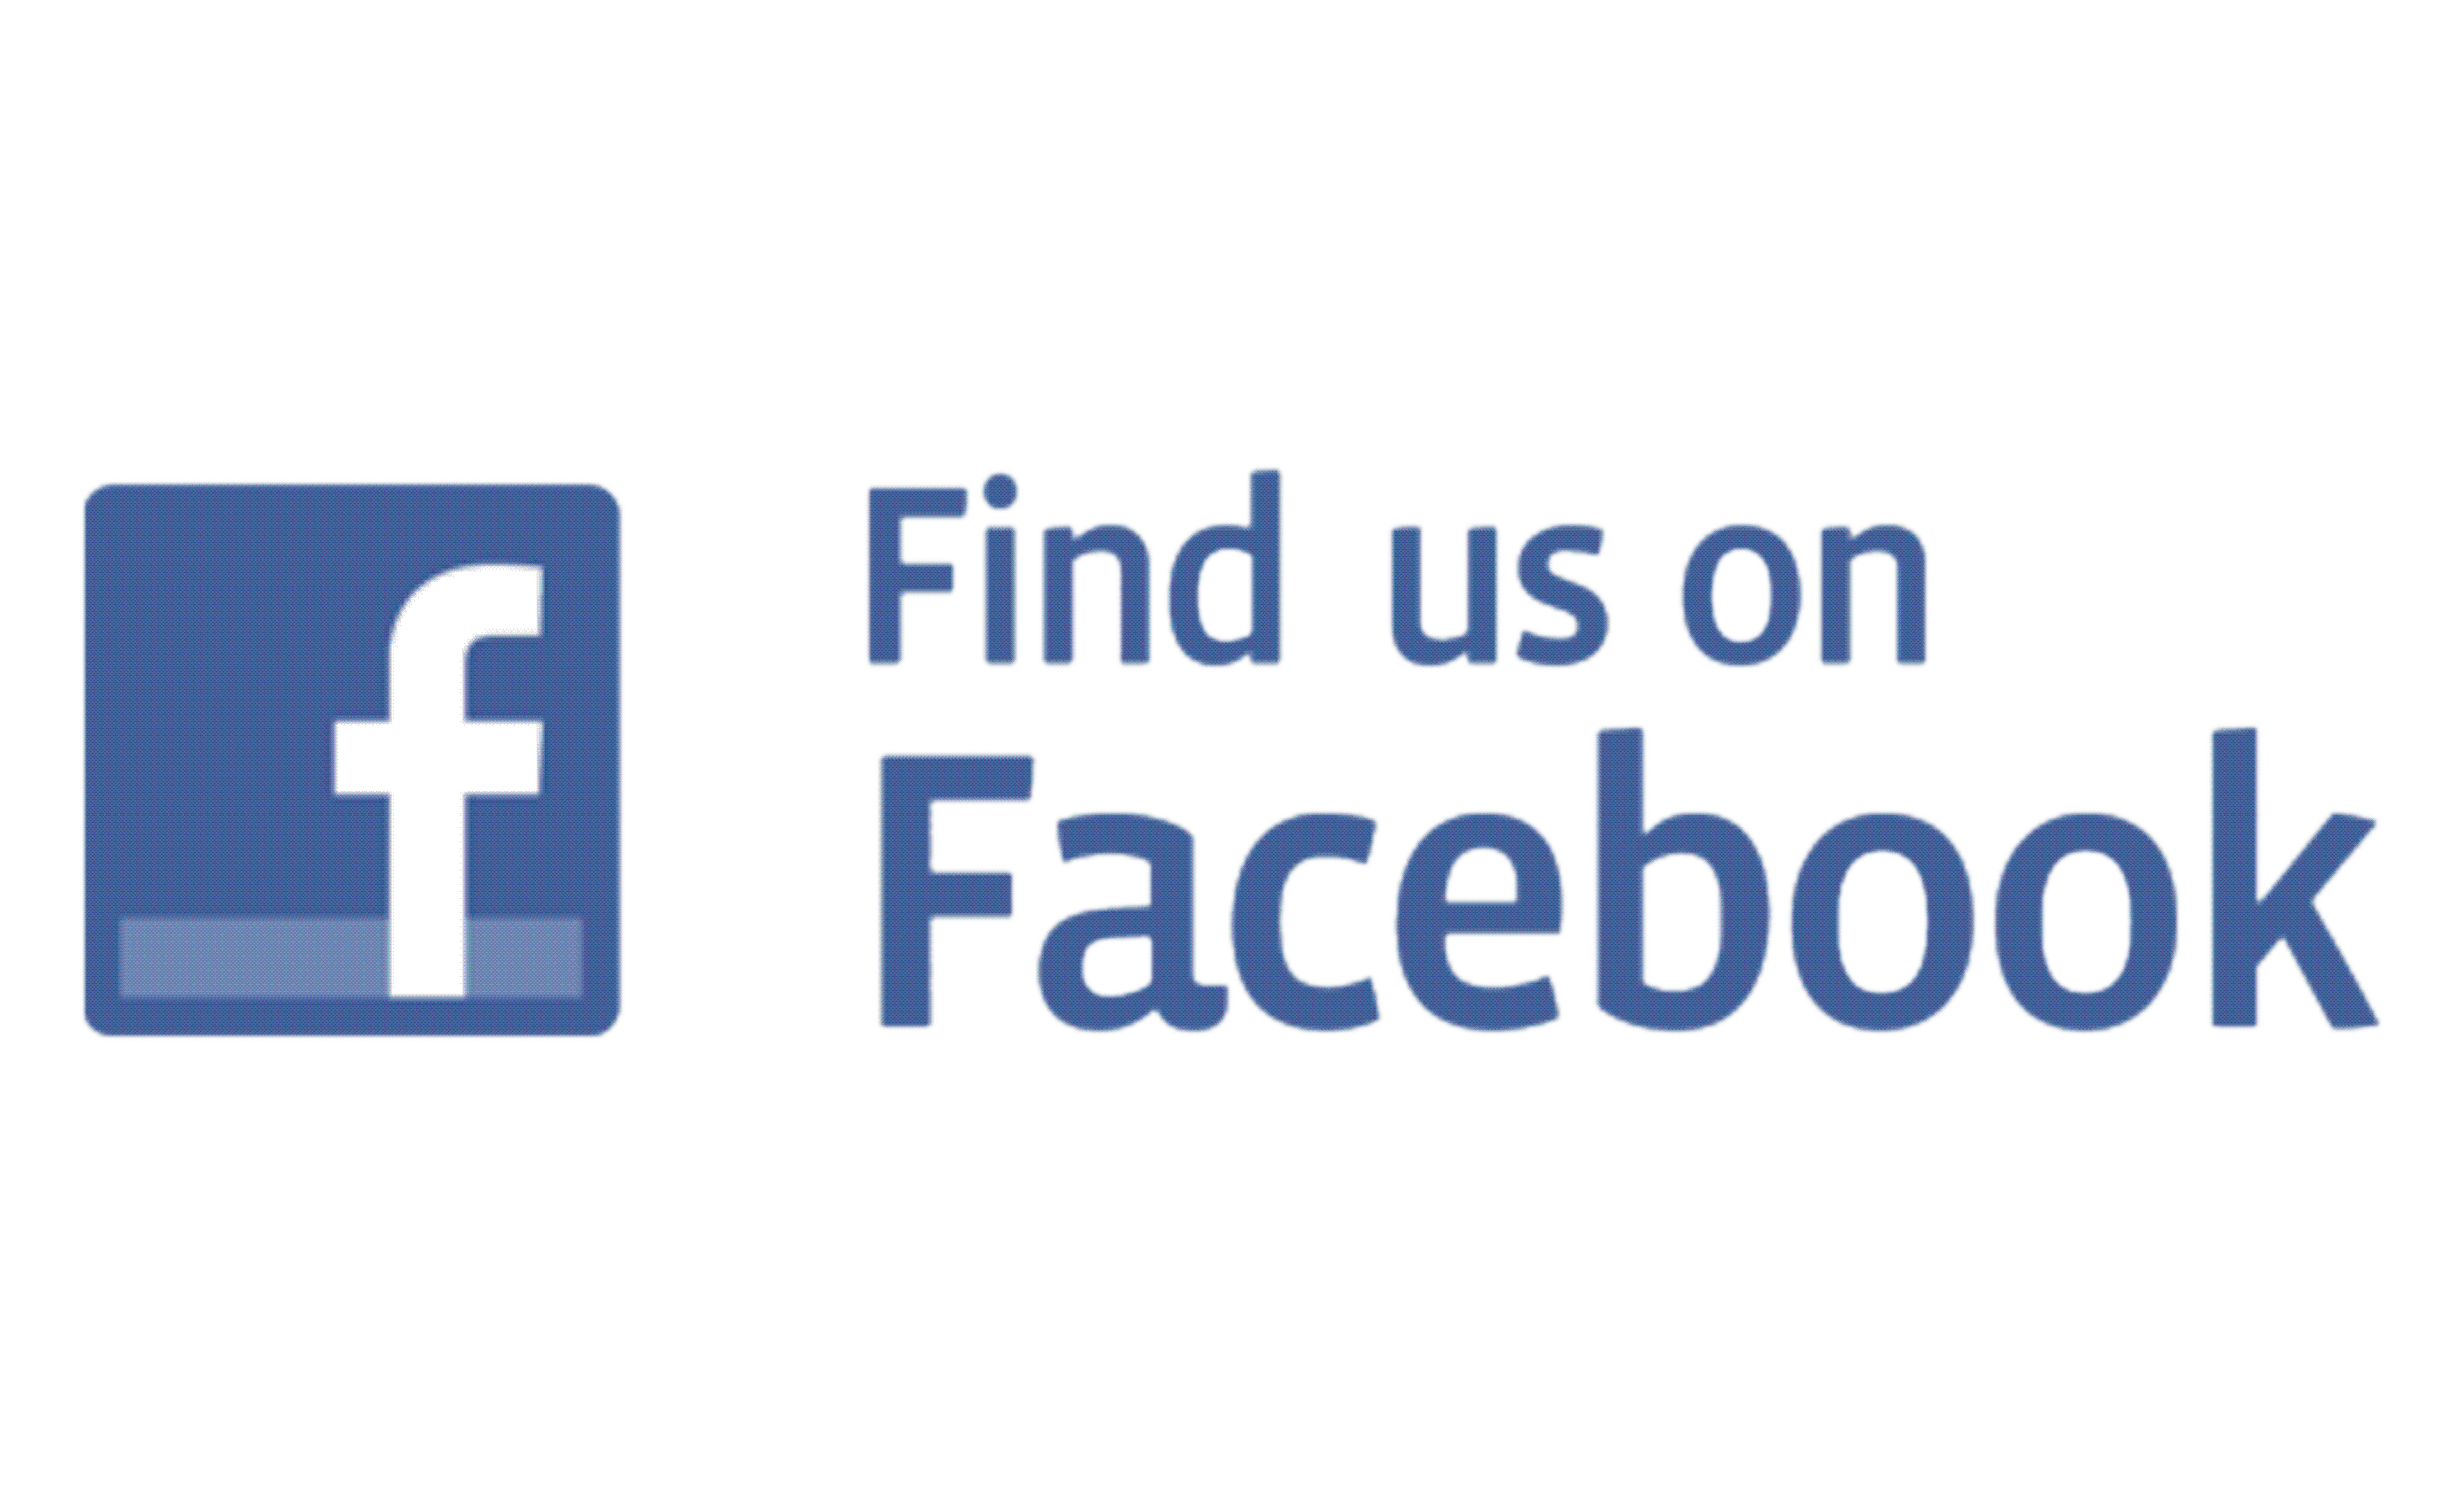 Facebook clipart share. Follow us on transparent